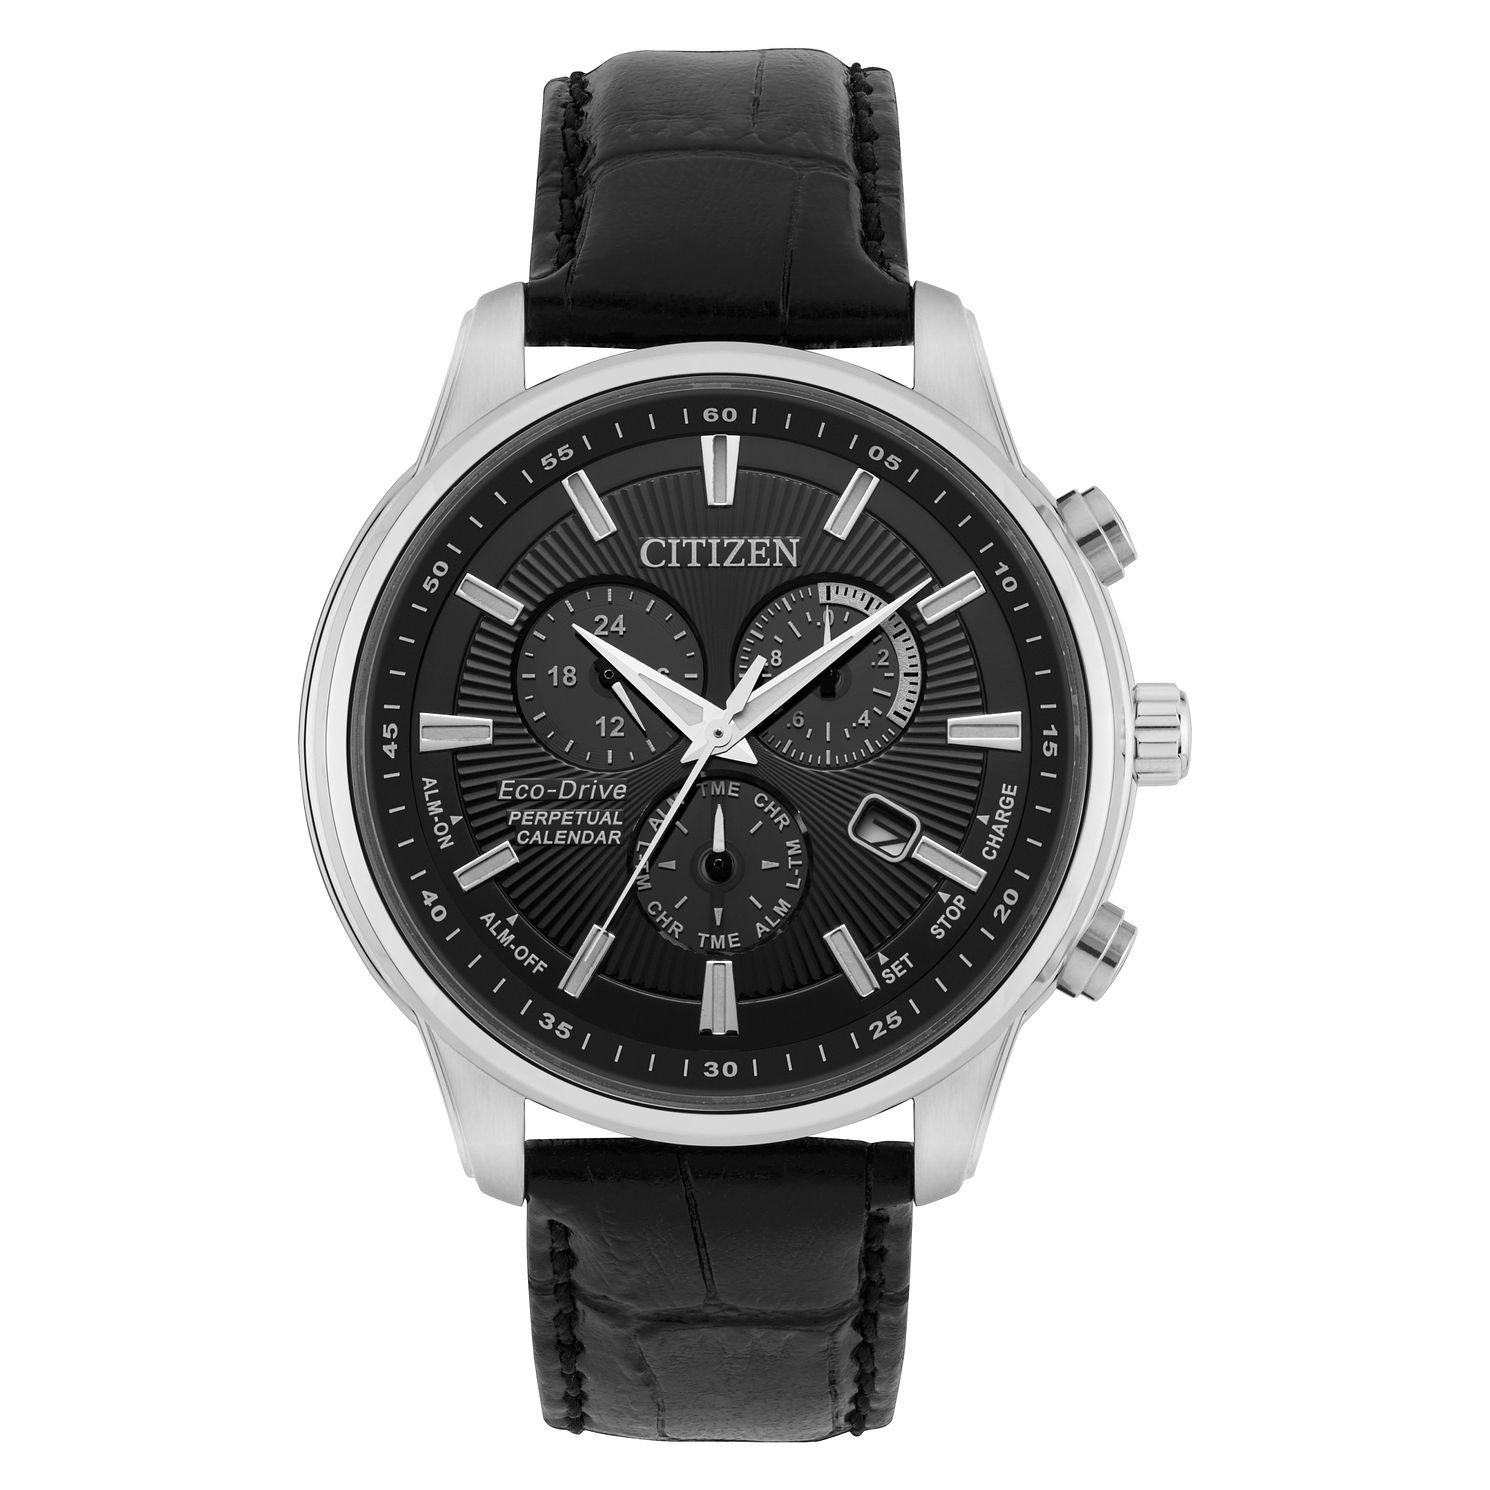 3a4aefc75 Citizen Men's Eco-Drive Black Leather Strap Watch BL5421-01E | H.Samuel